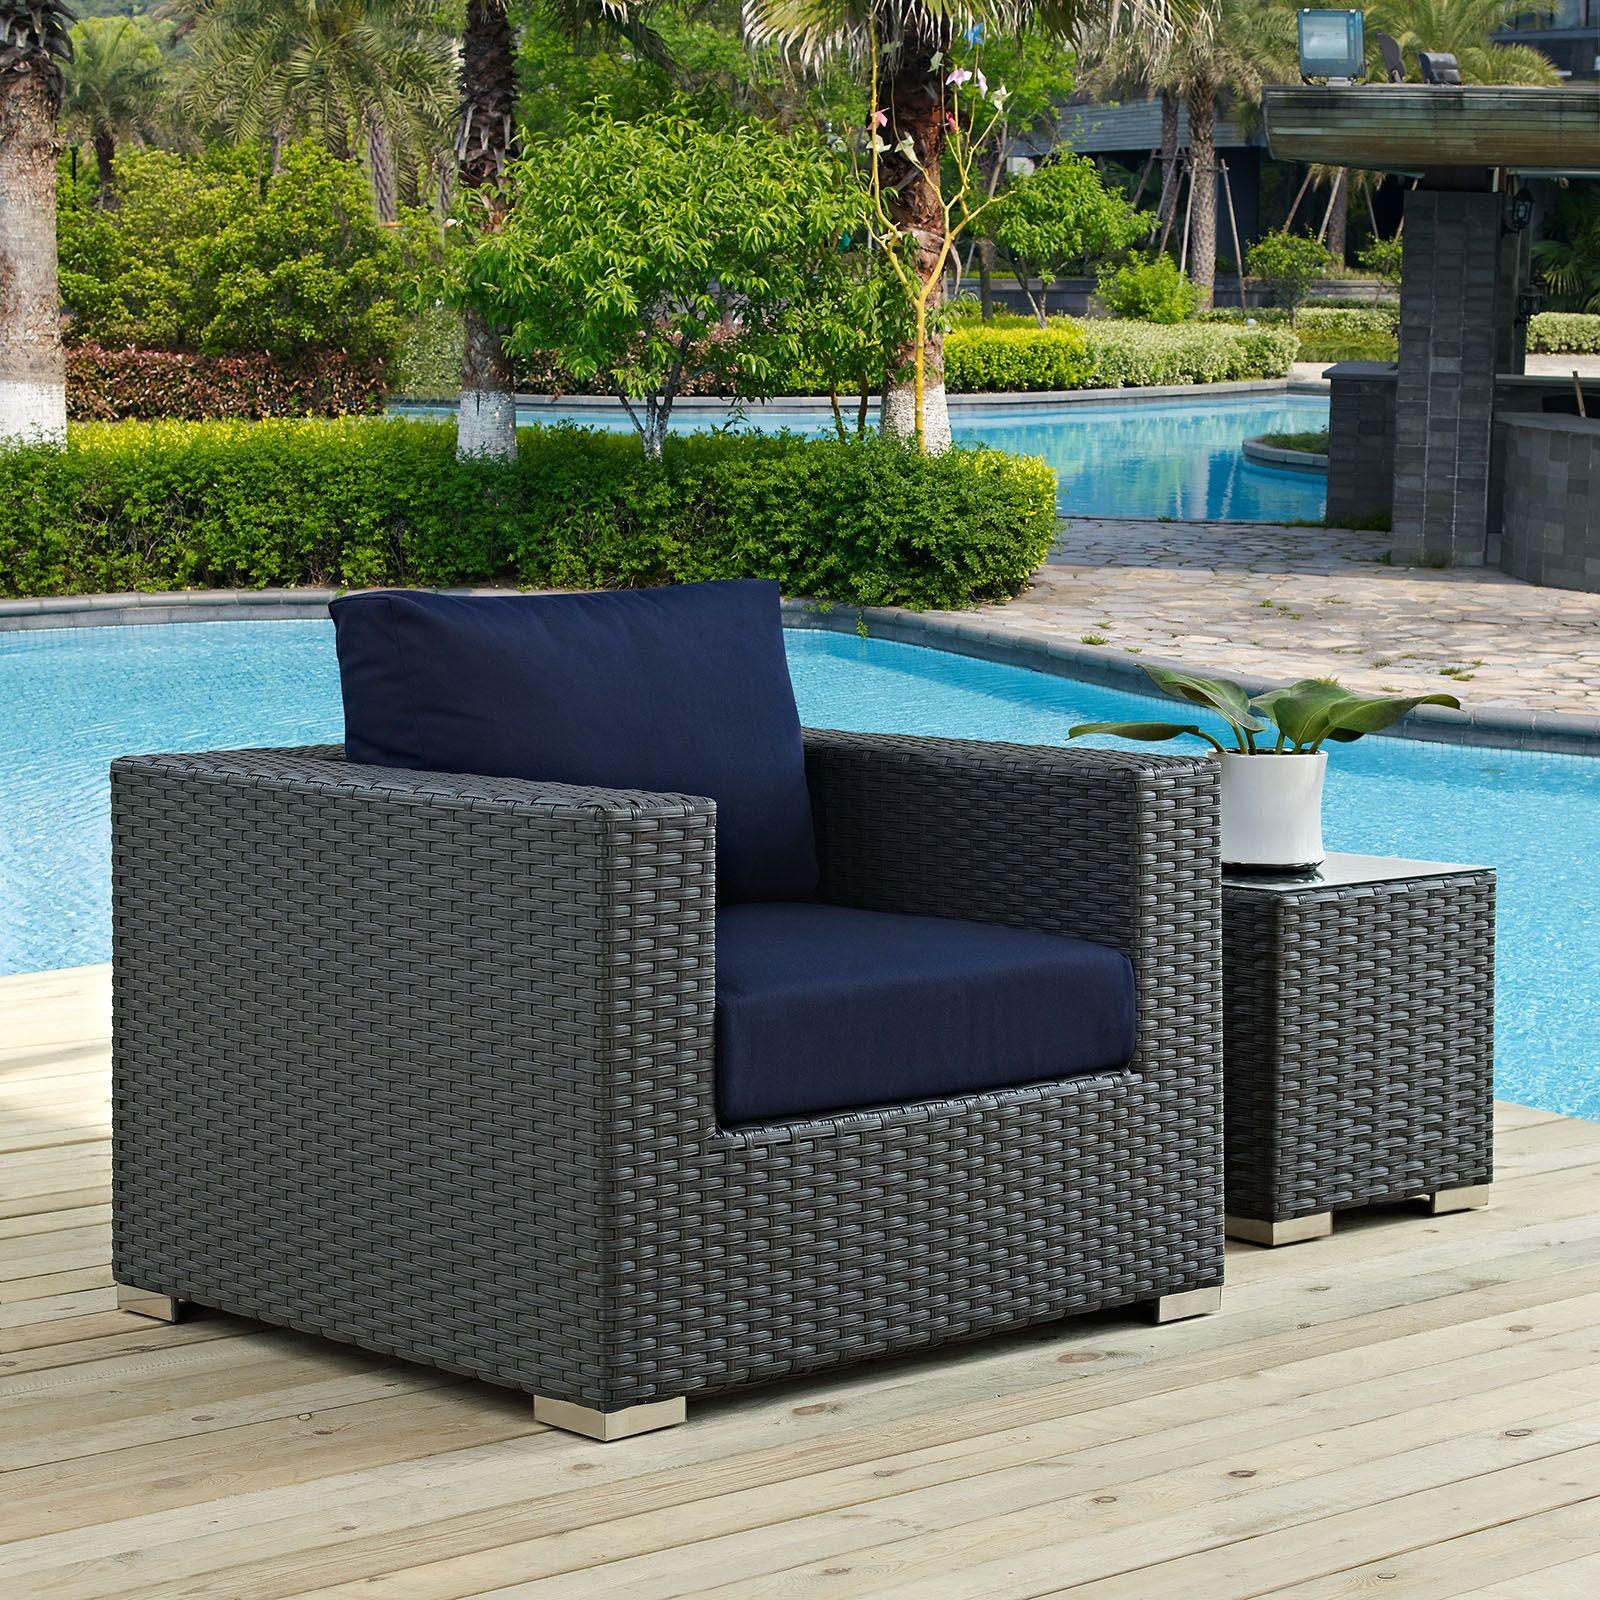 Sojourn canvas navy outdoor patio sunbrella armchair eei for Sunbrella patio furniture